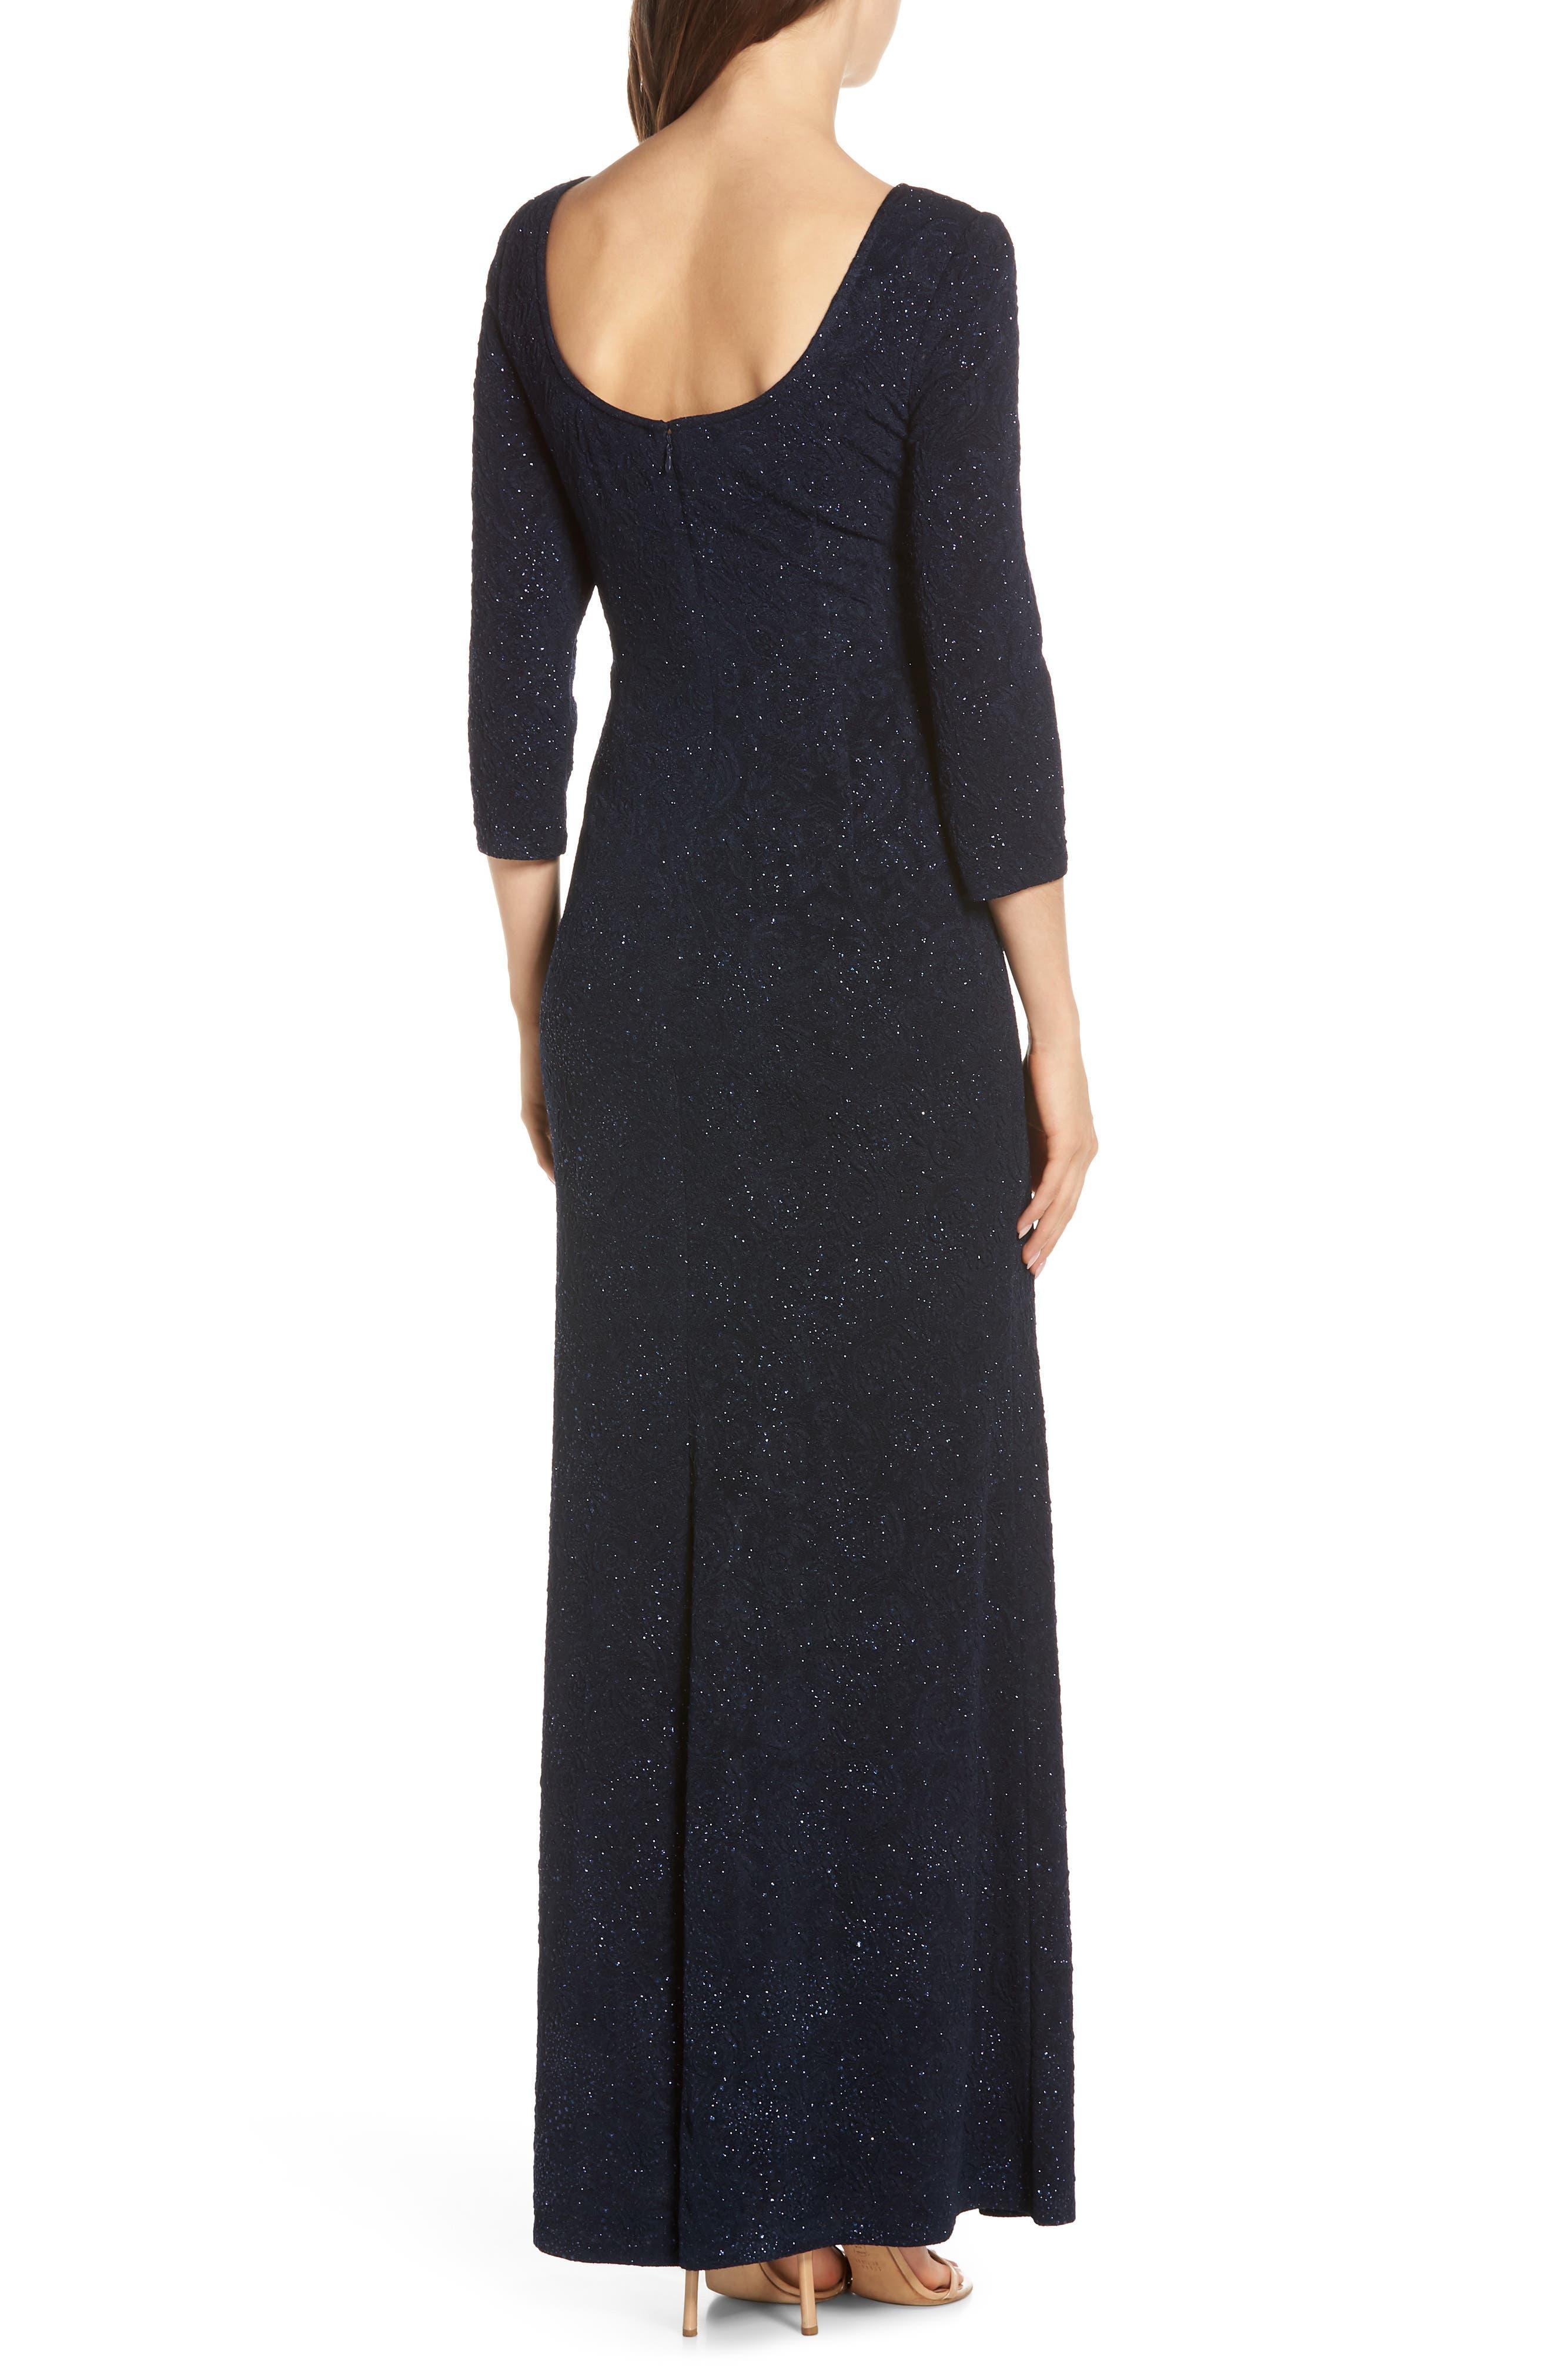 ALEX EVENINGS, Knot Front Sequin Jacquard Evening Dress, Alternate thumbnail 2, color, NAVY